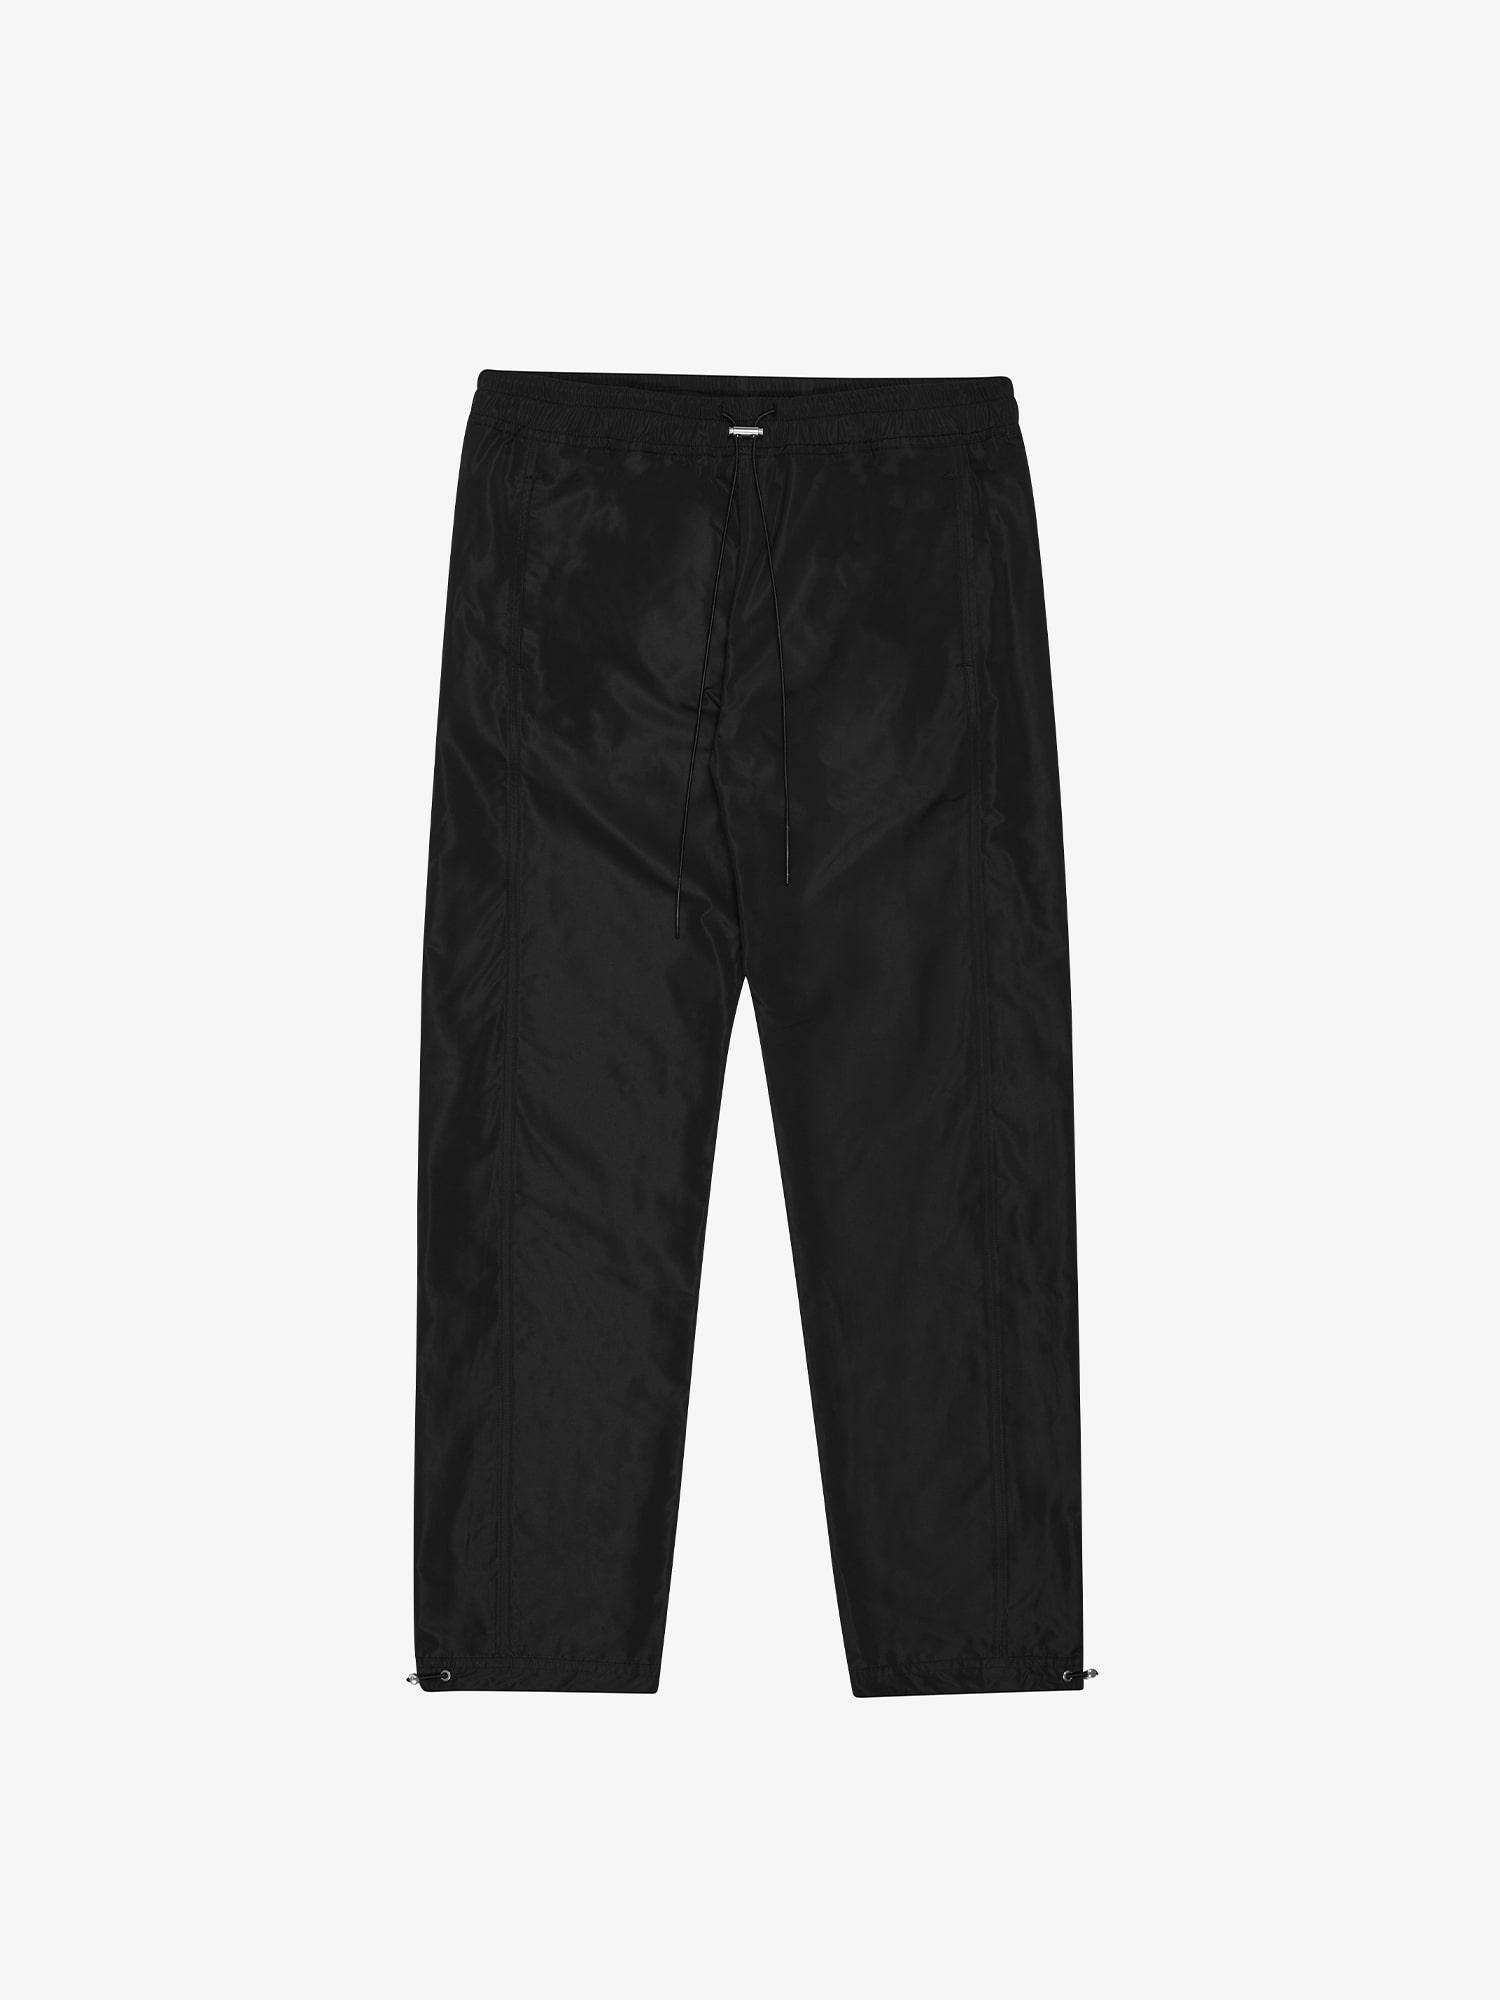 PANELLED TRACK PANTS - BLACK